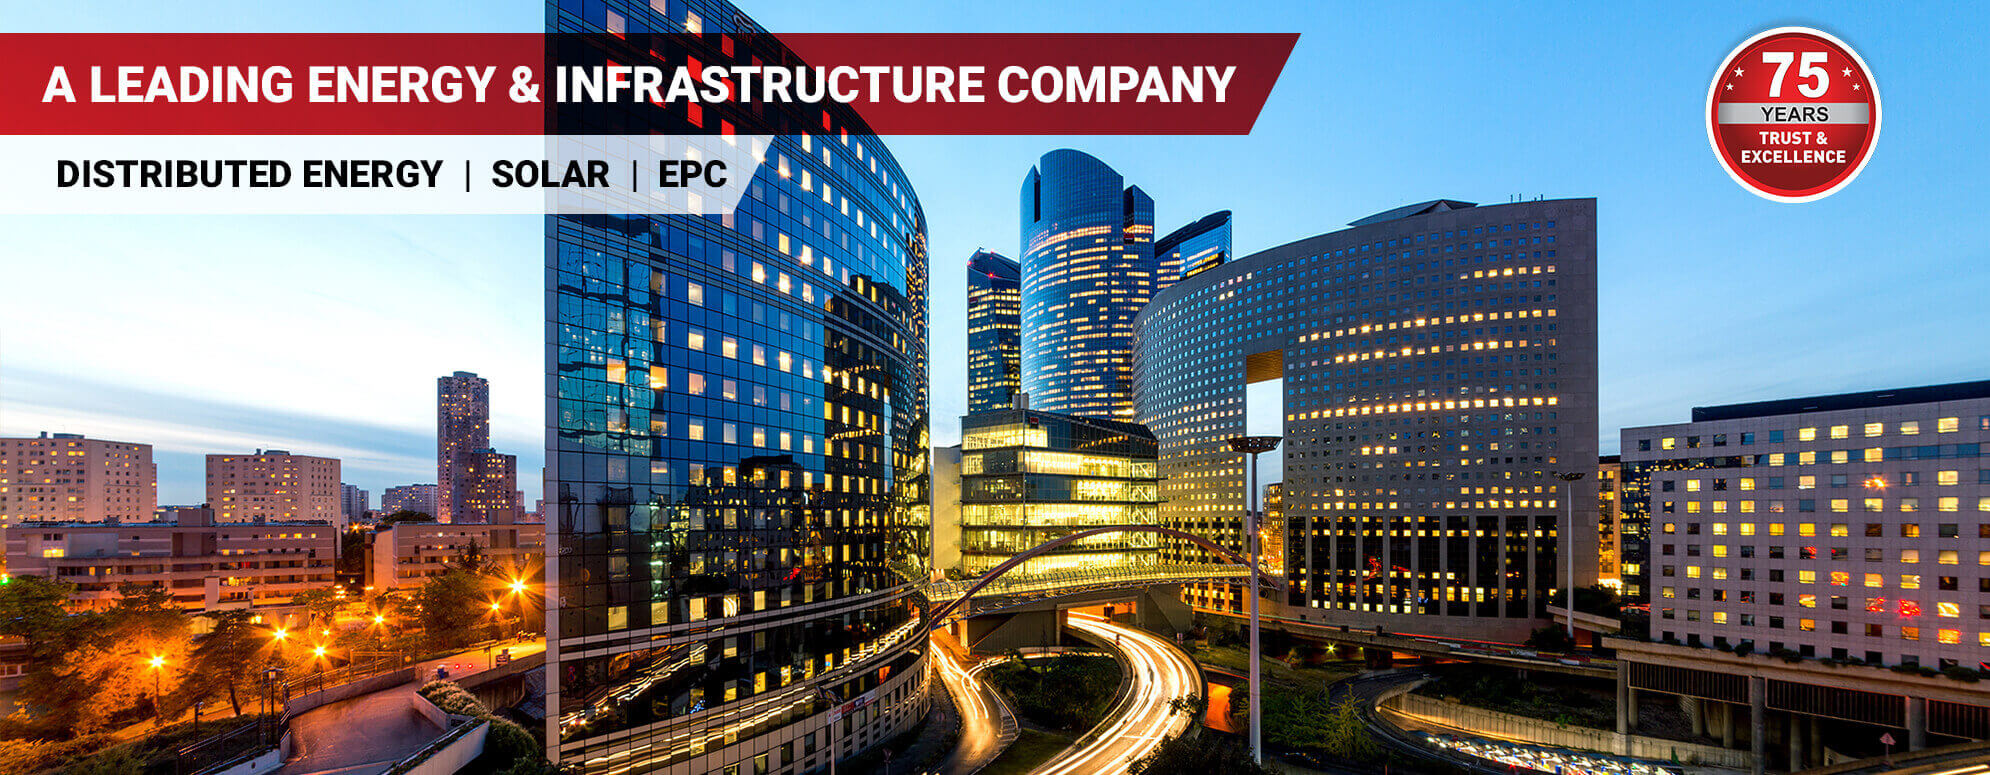 Corporate Banner -  ENERGY & INFRASTRUCTURE